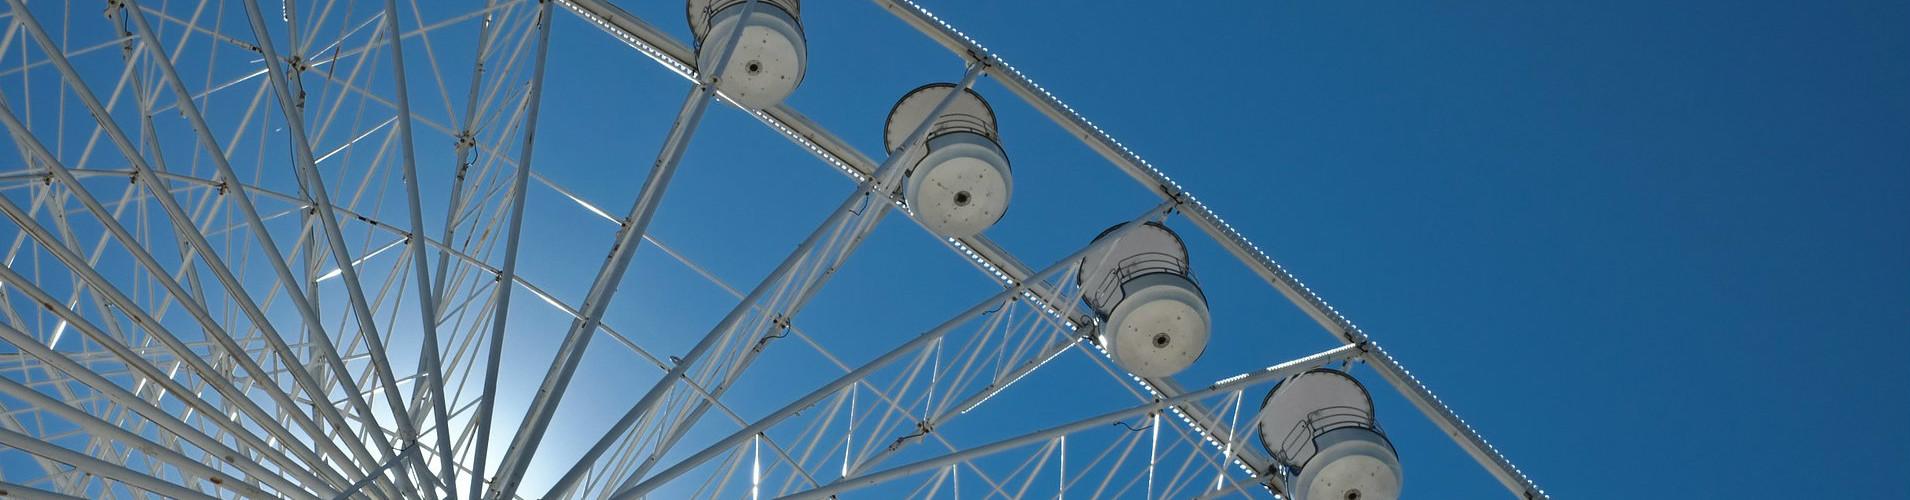 Ferris wheel hire